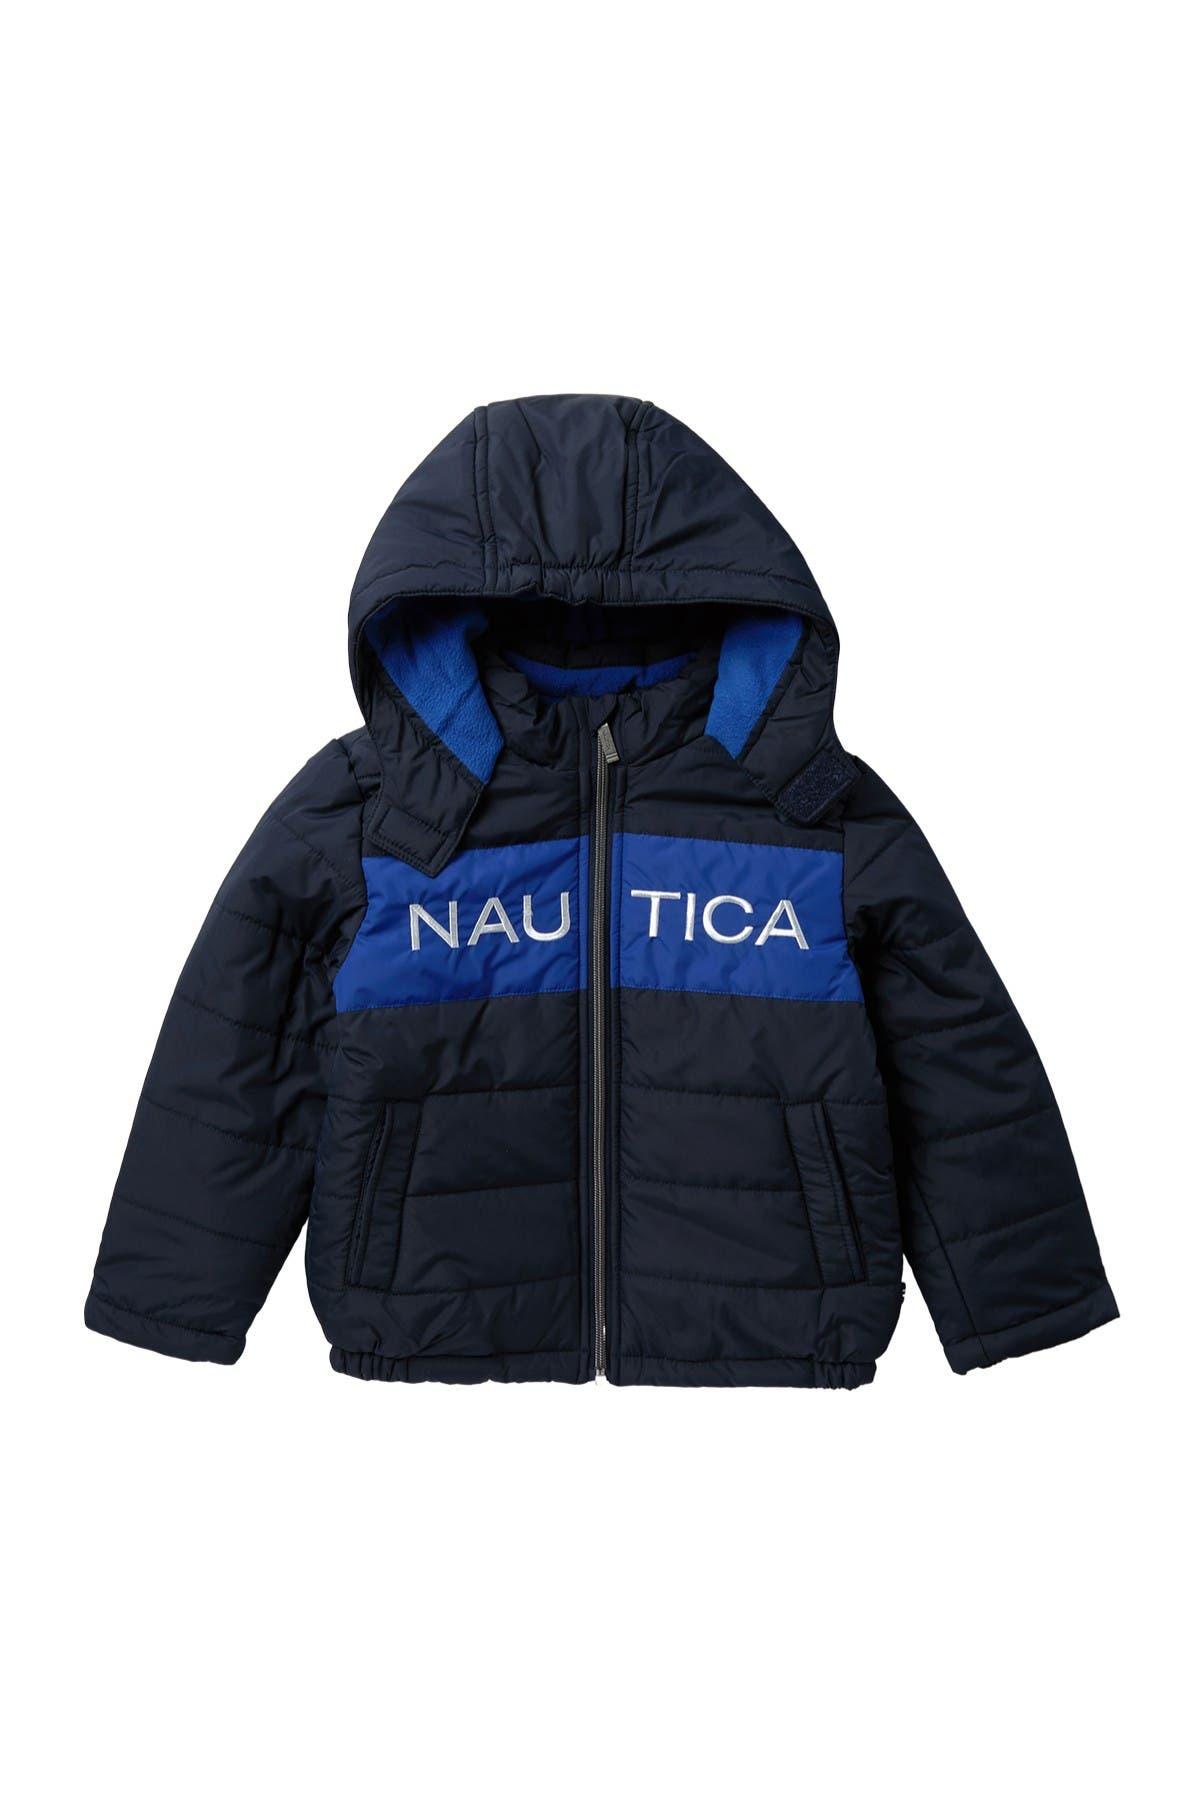 Nautica Boys Fleece Lined Hooded Bubble Jacket